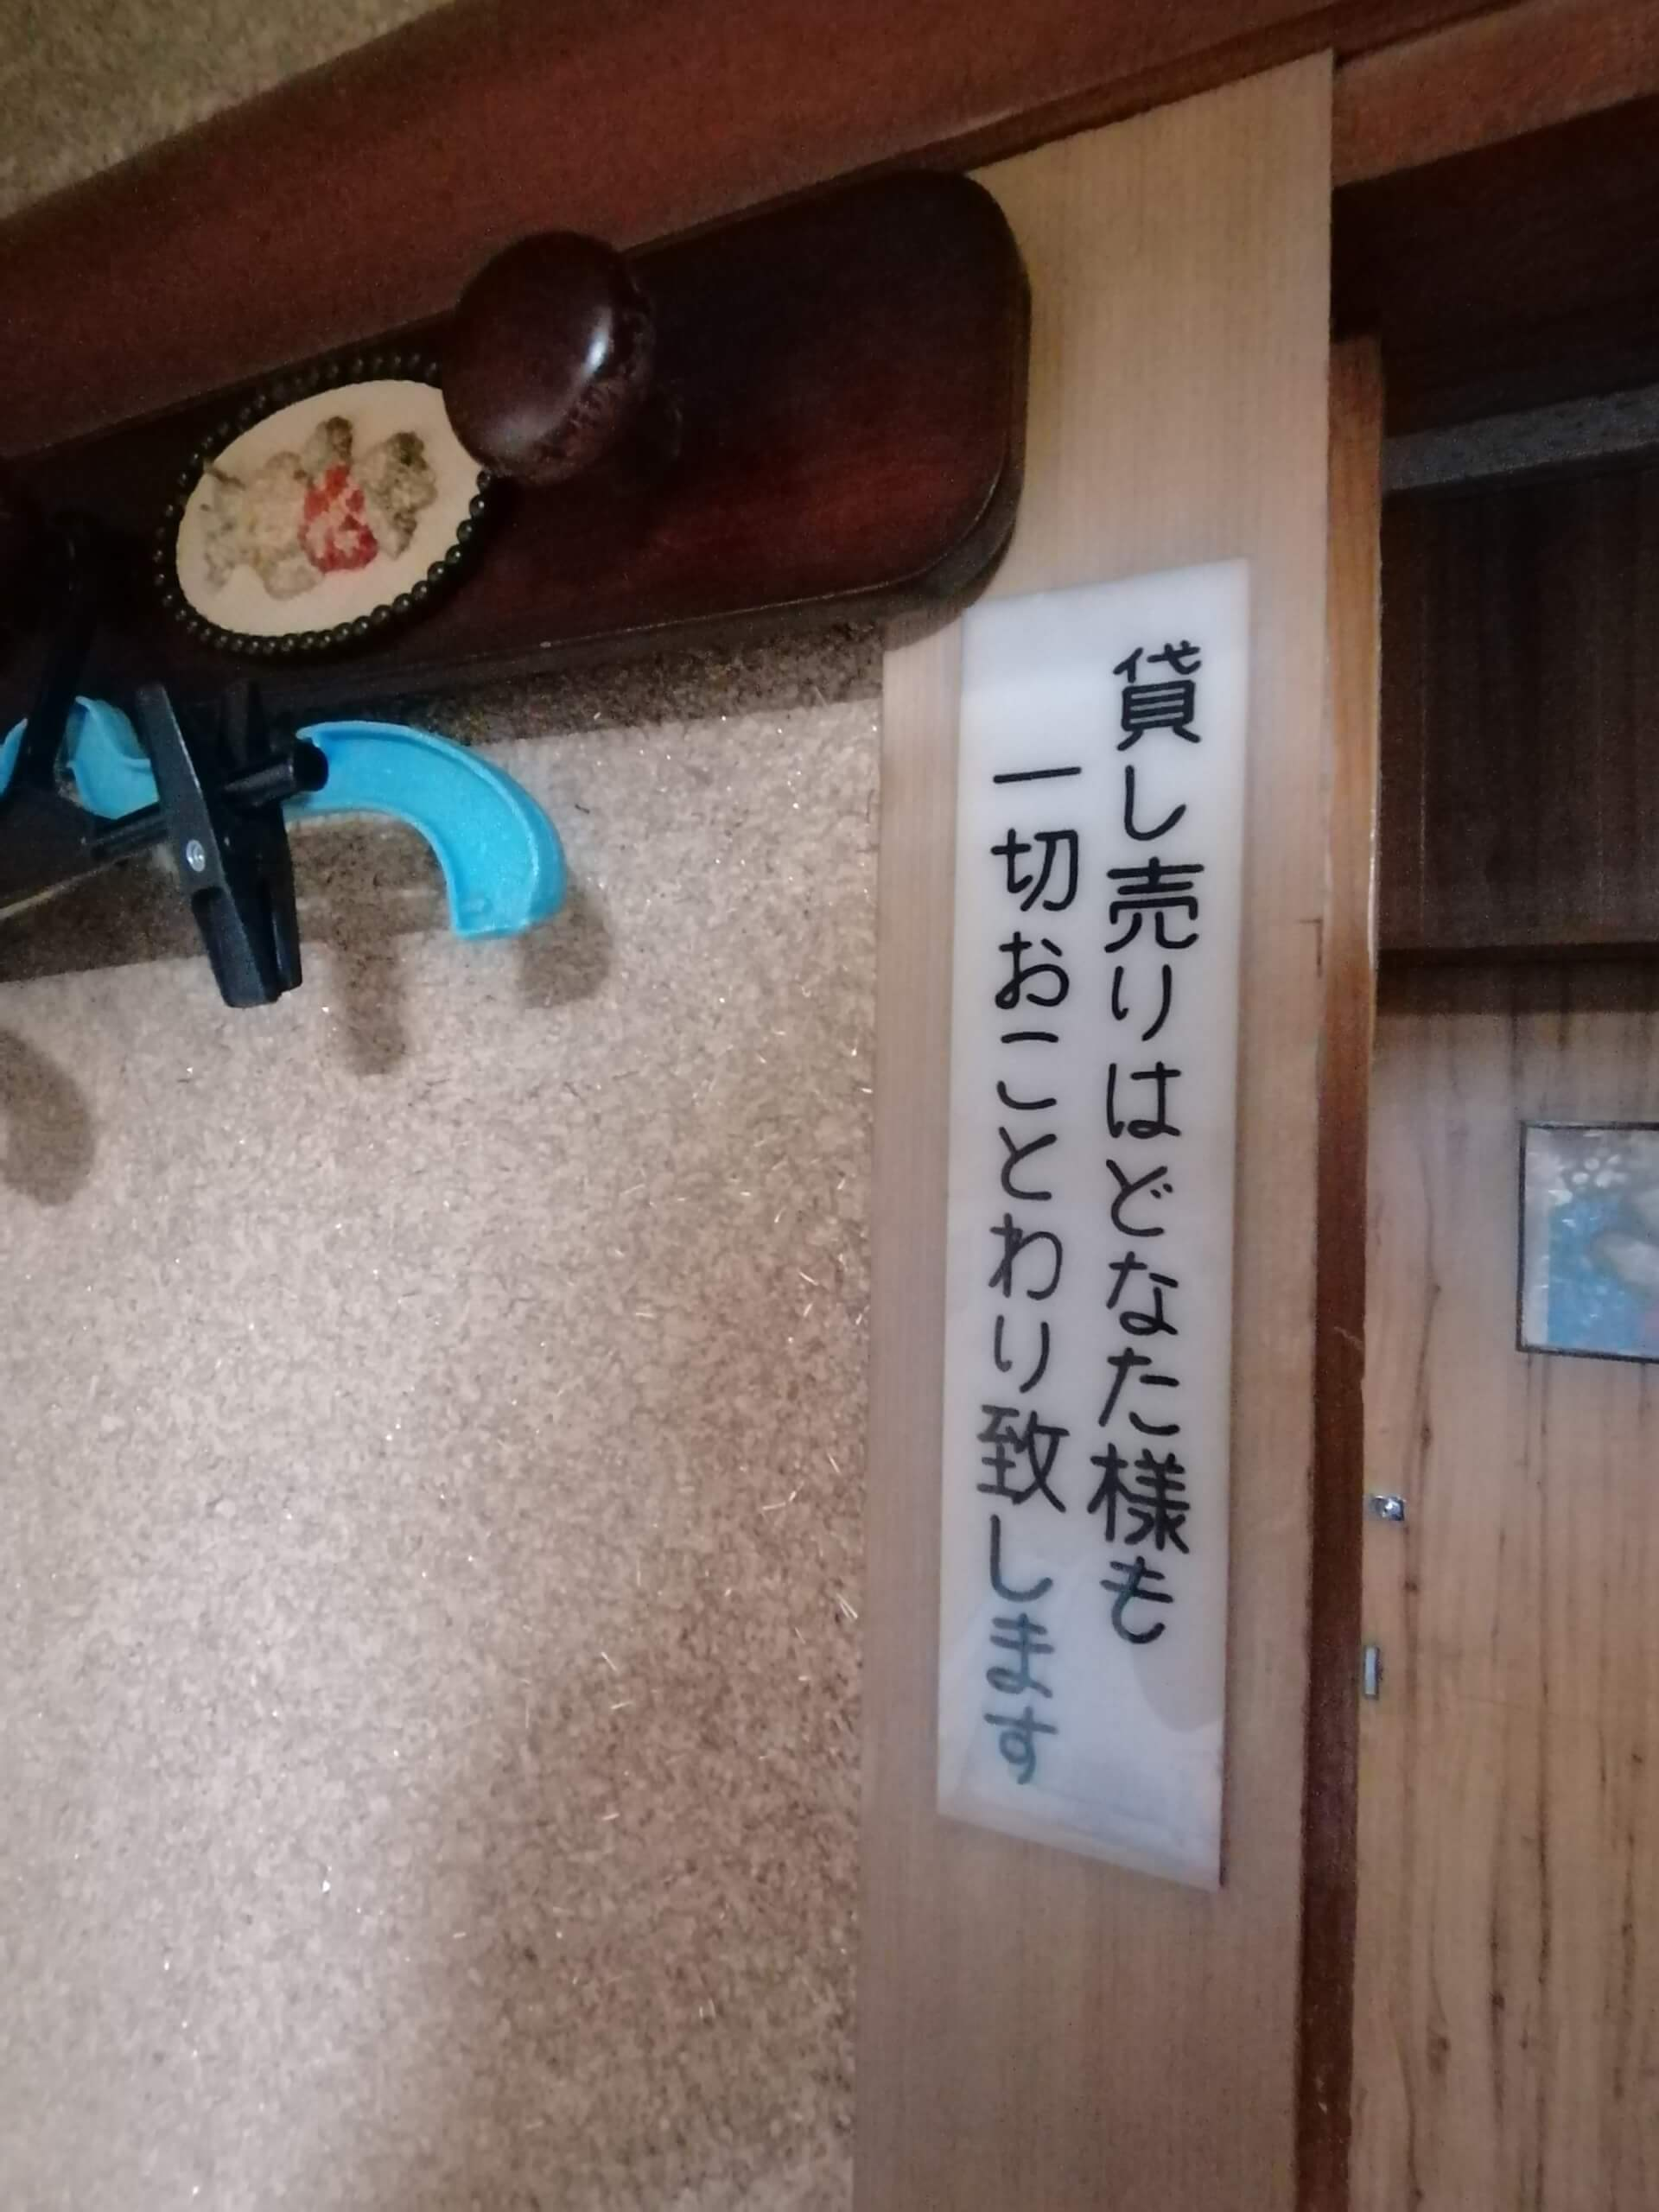 中標津の木賃宿